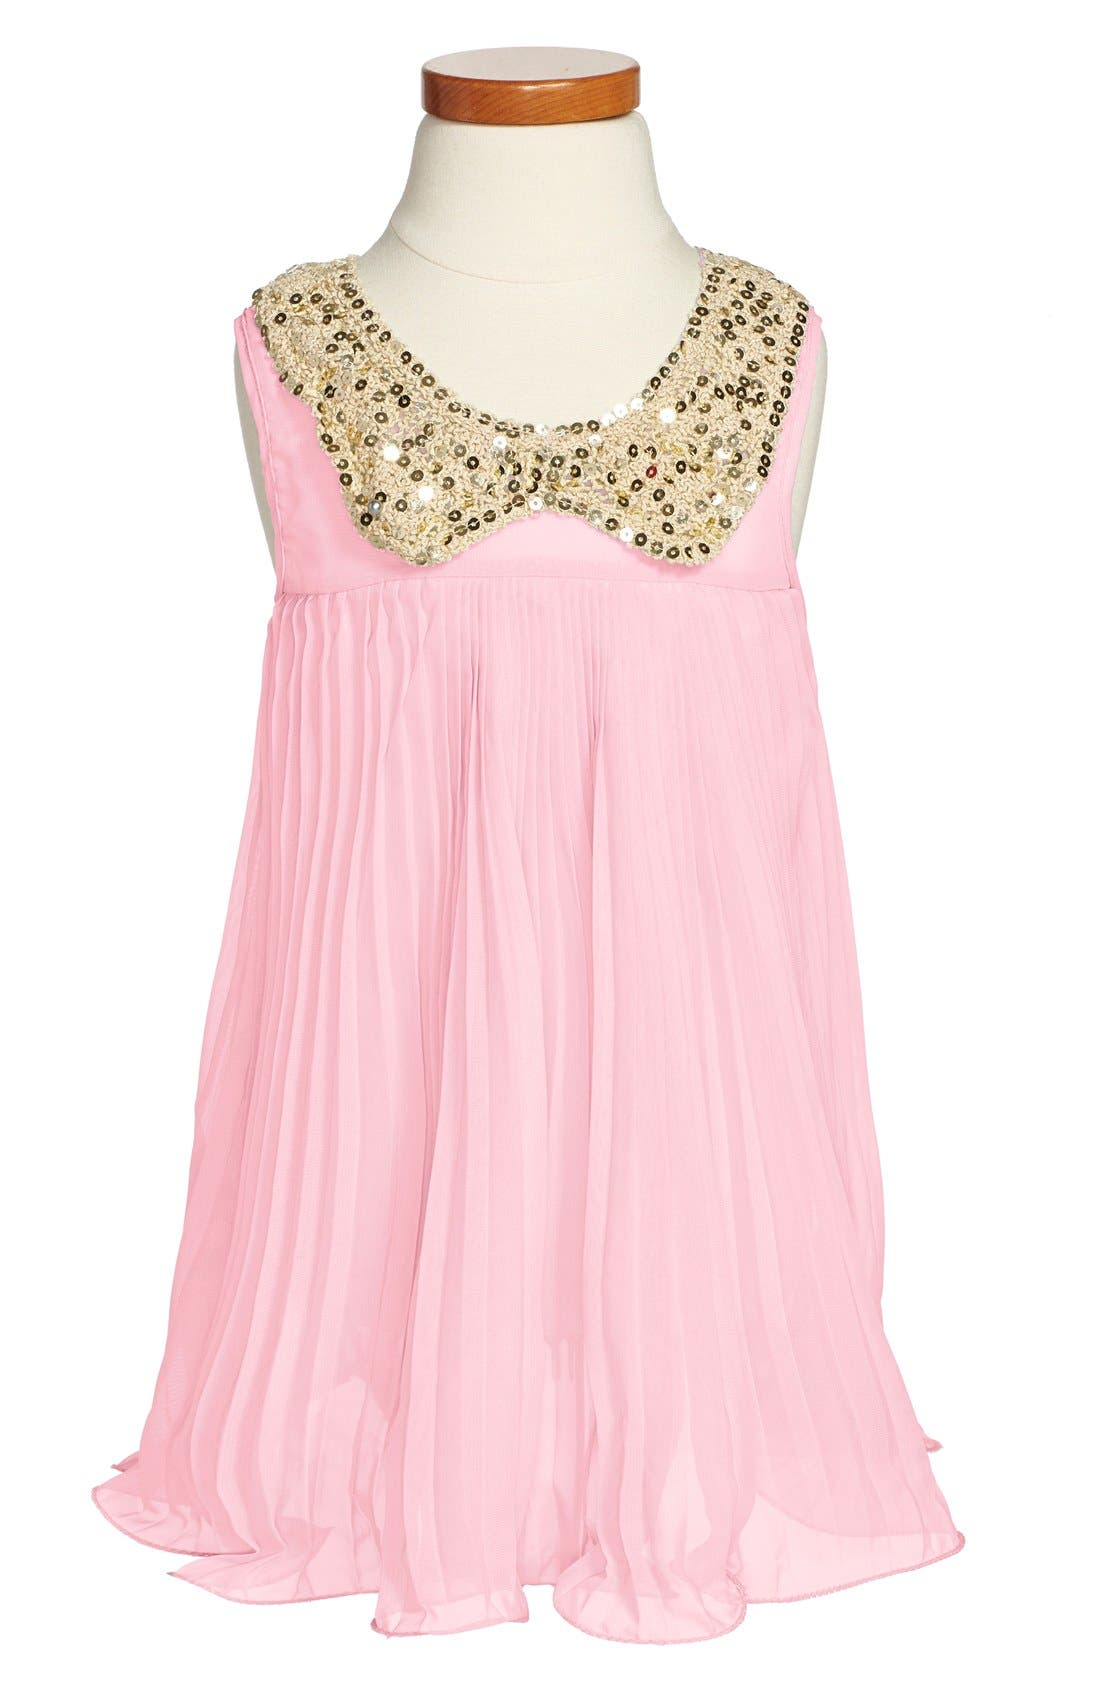 Alternate Image 1 Selected - Popatu Pleated Sleeveless Dress (Toddler Girls & Little Girls)